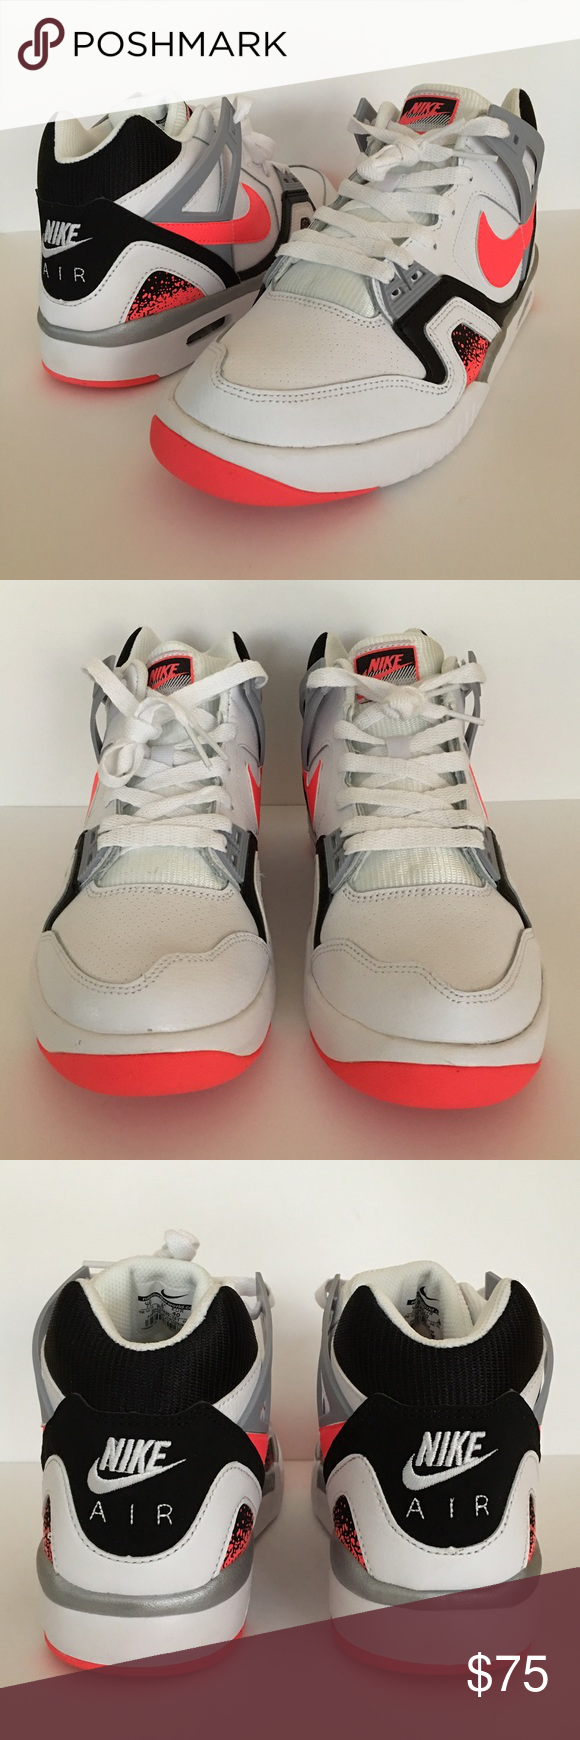 Nike Air Tech Challenge Kids size 7y (women's 8.5) Brand